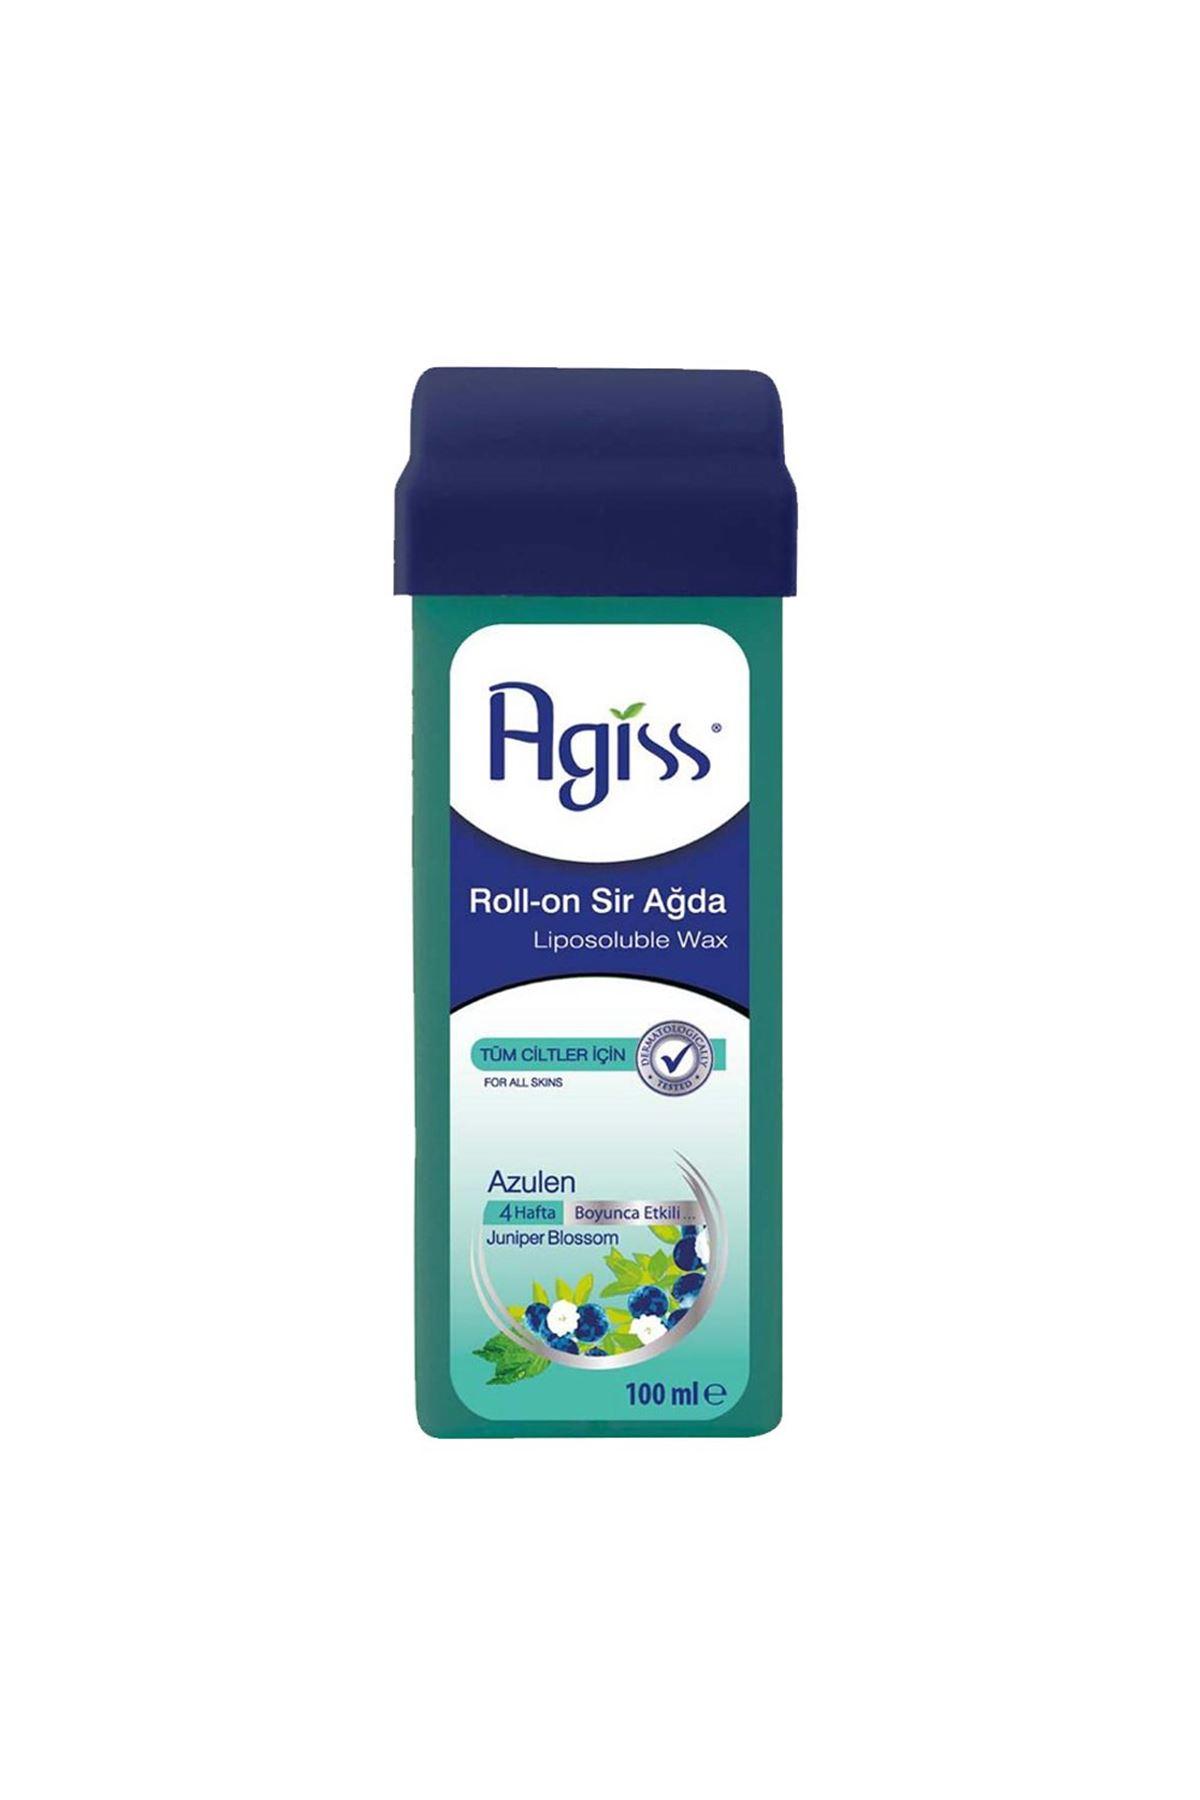 Agiss Roll-On Sir Ağda Azulen 100 ML